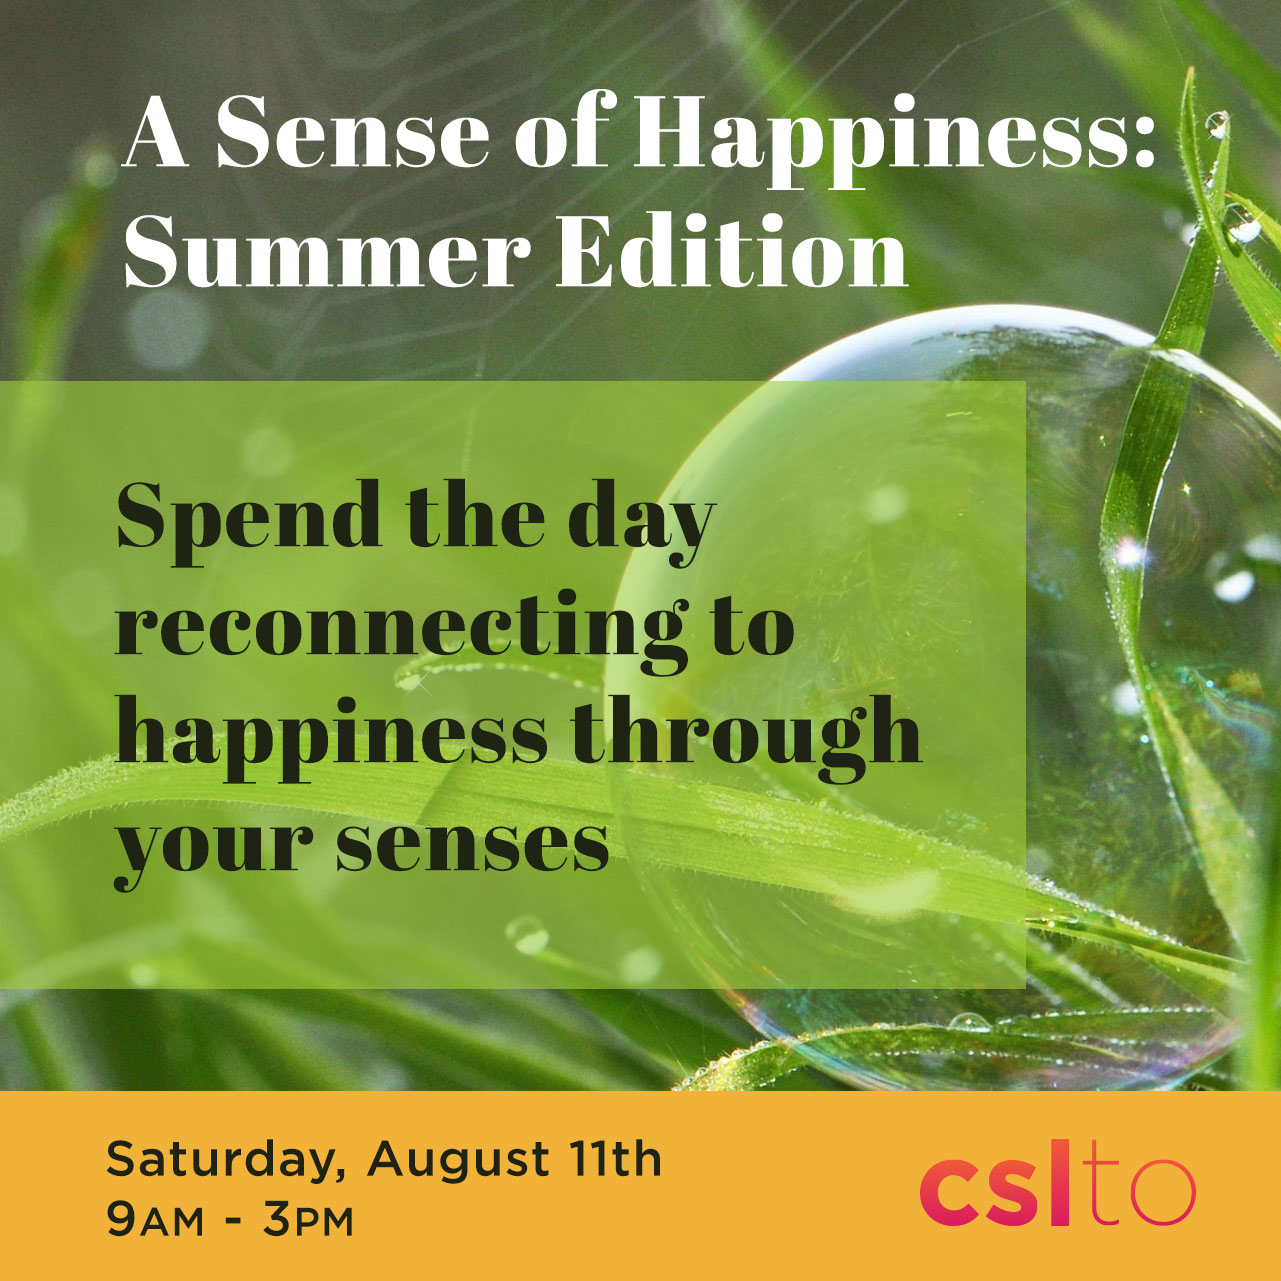 a-sense-of-happiness-cslto